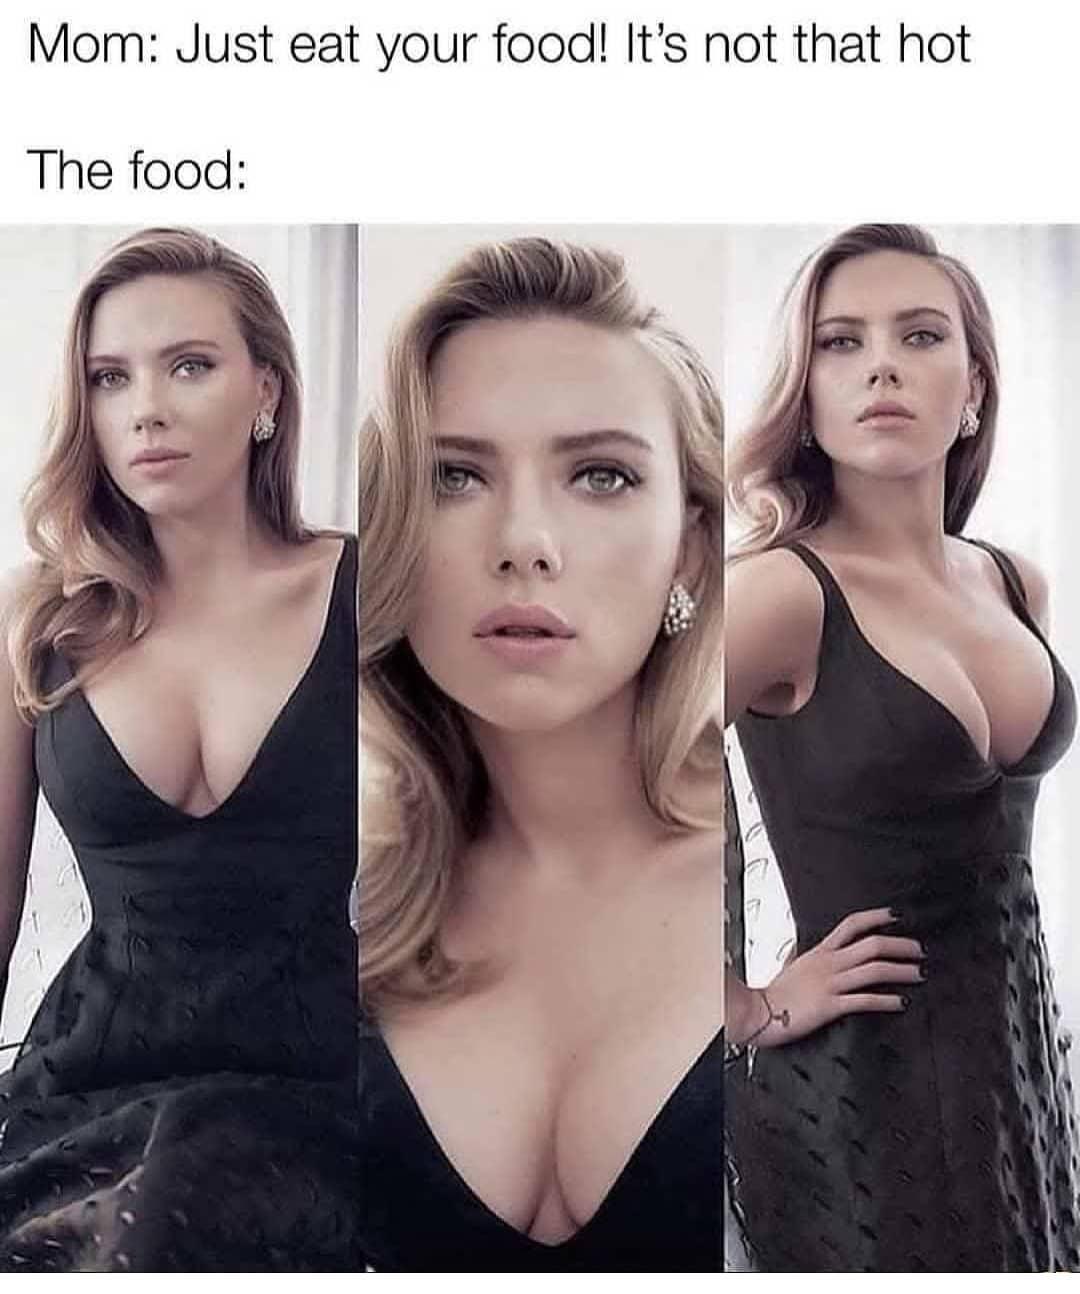 Scarlett Johansson : Eat Your Food Meme